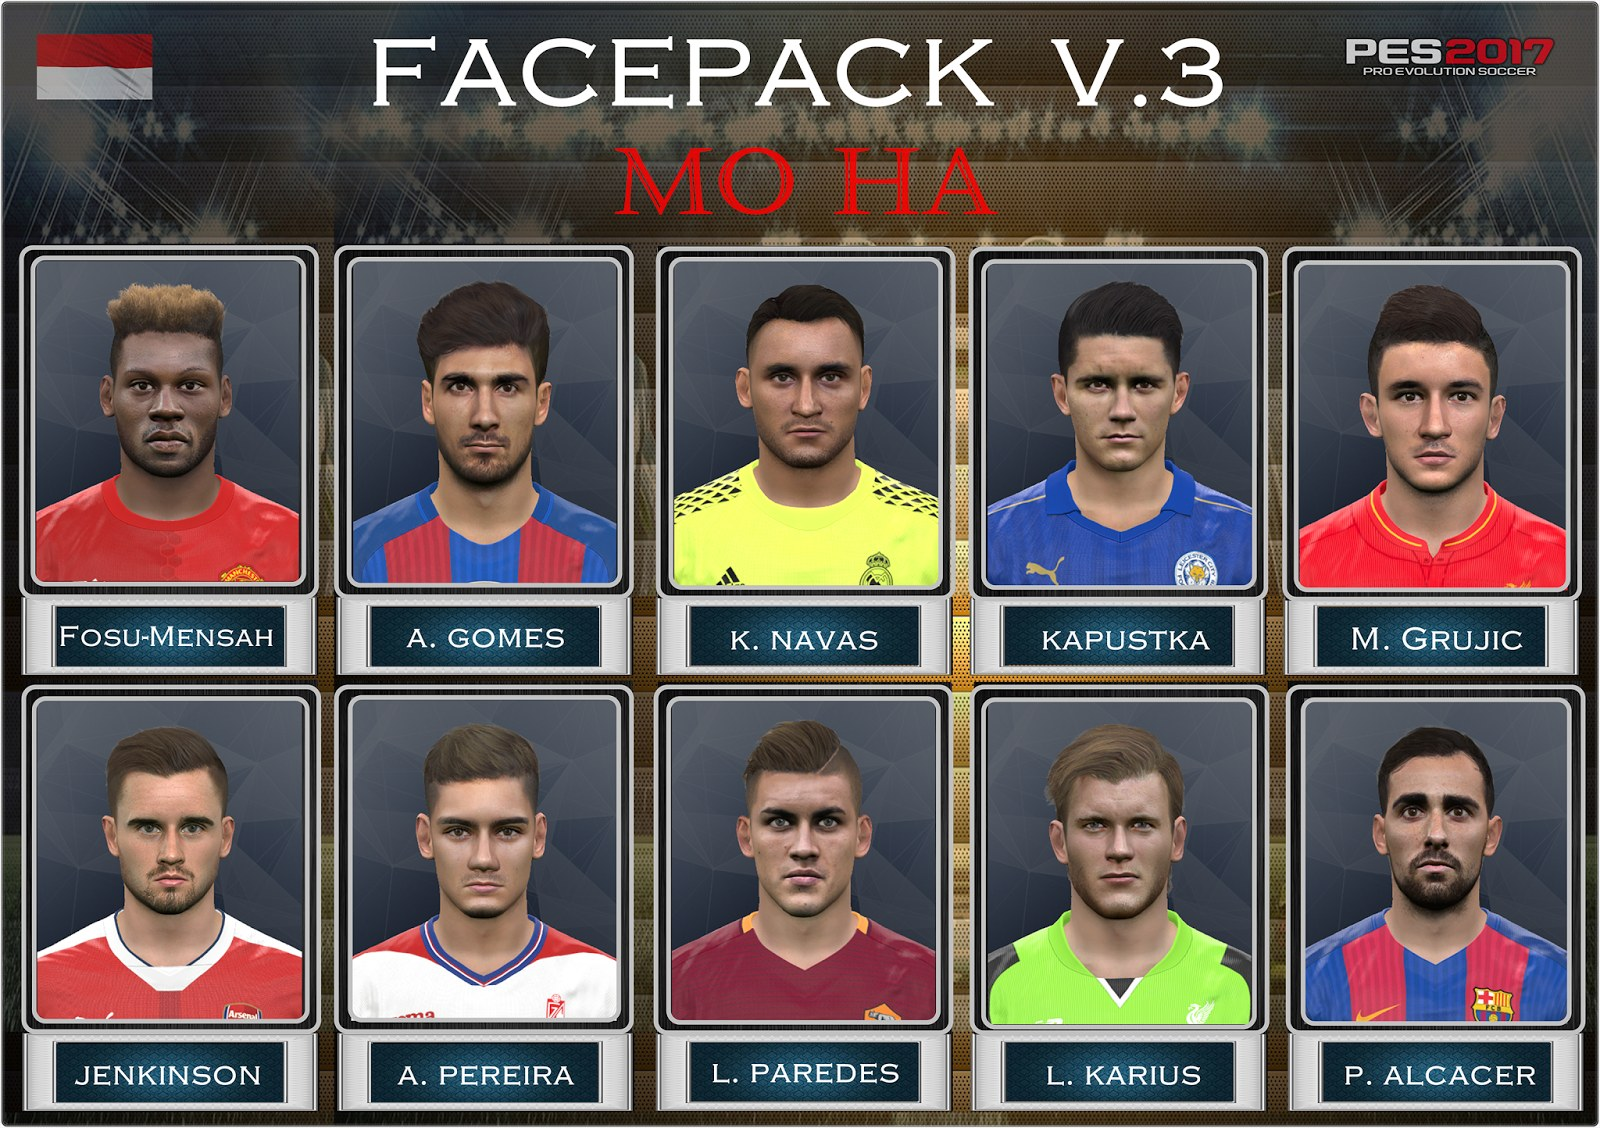 pes-2017-facepack-v3-by-mo-ha-pes-kings